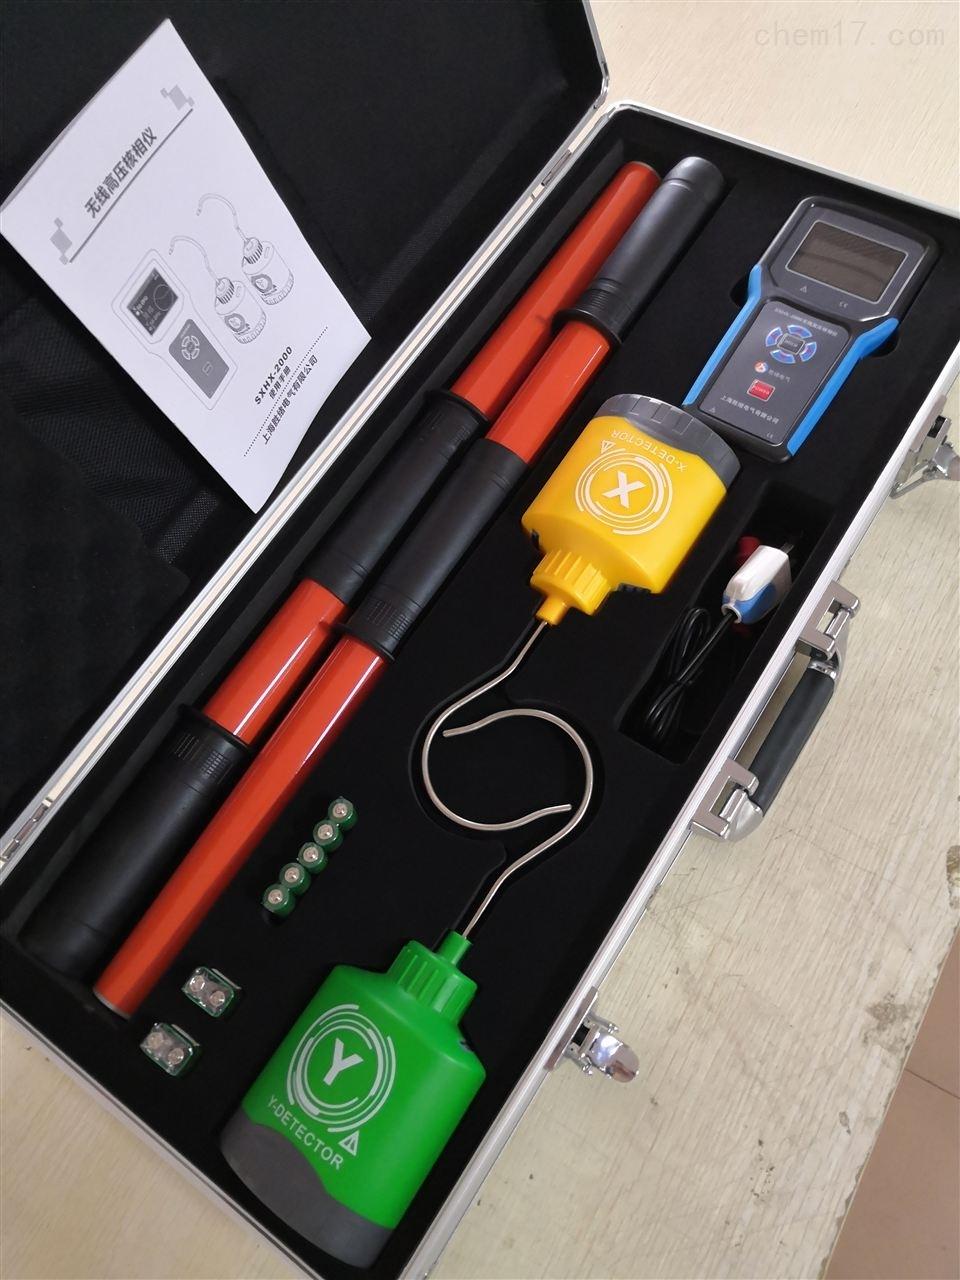 SXHX-2000无线语音高压核相仪